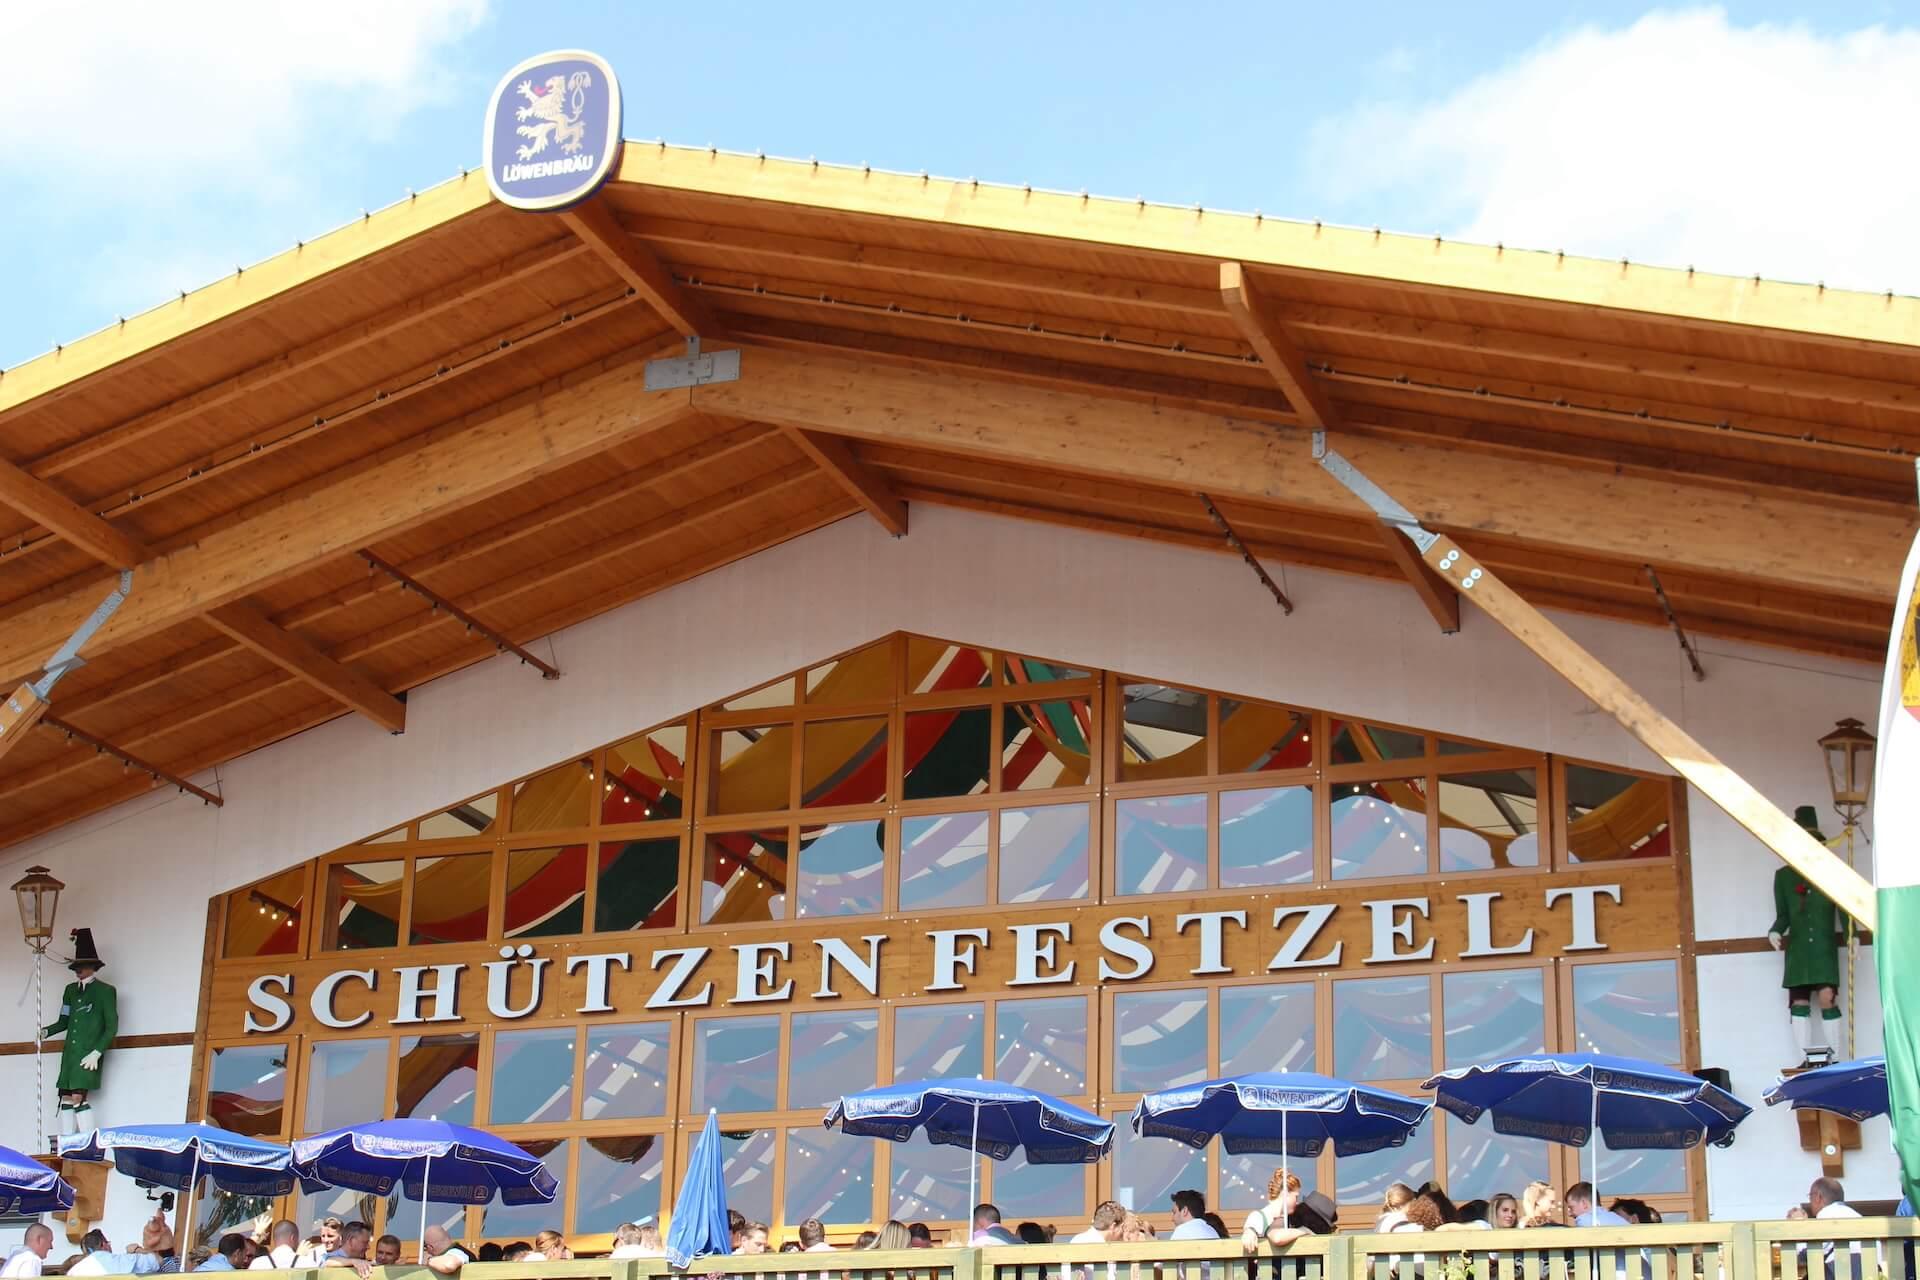 Oktoberfest Beer Tent - Schutzen